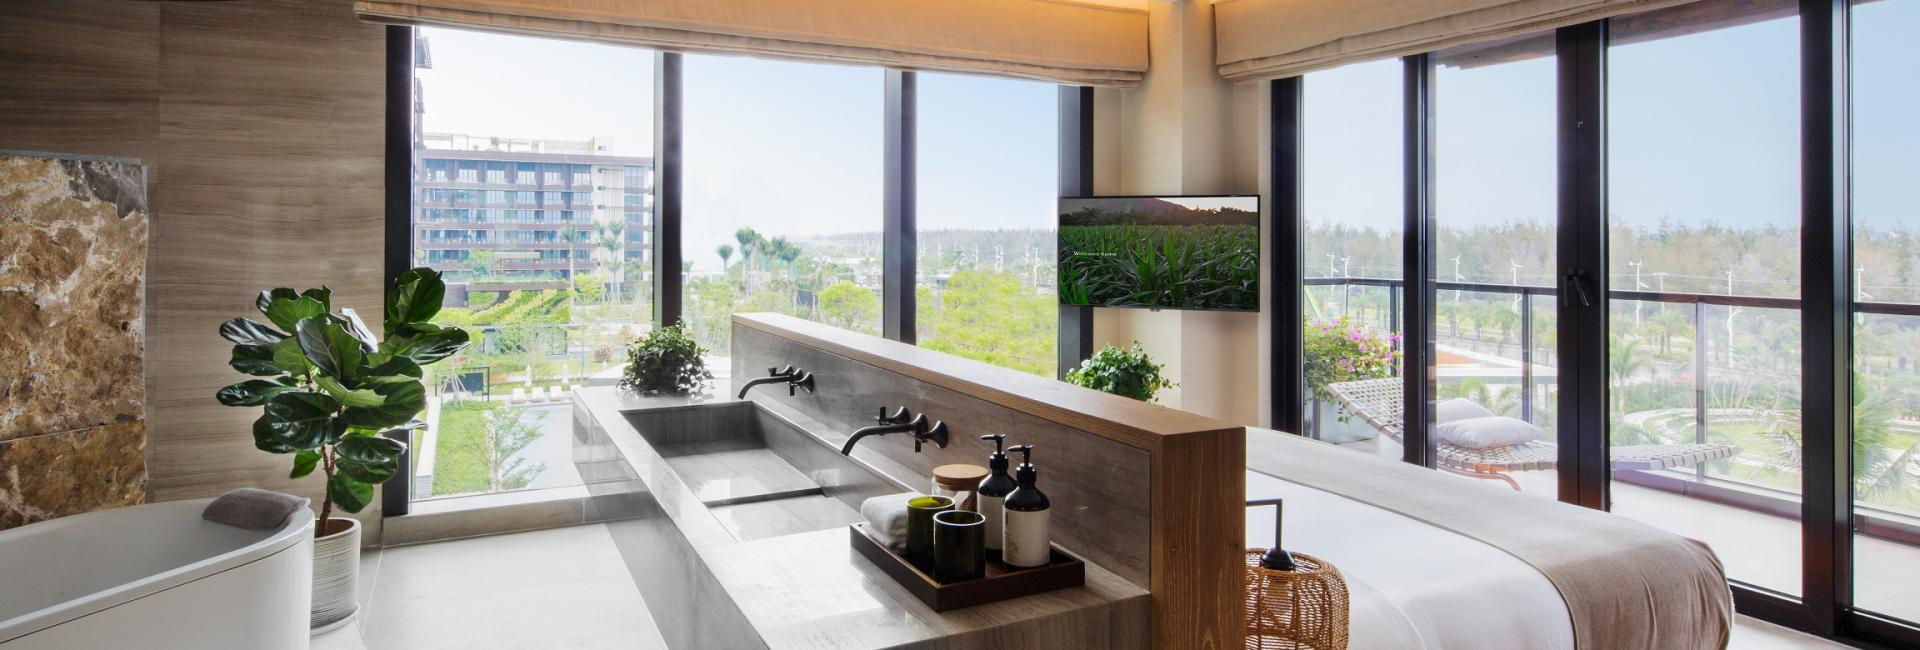 Botanic Pool View Family Suite-Bedroom